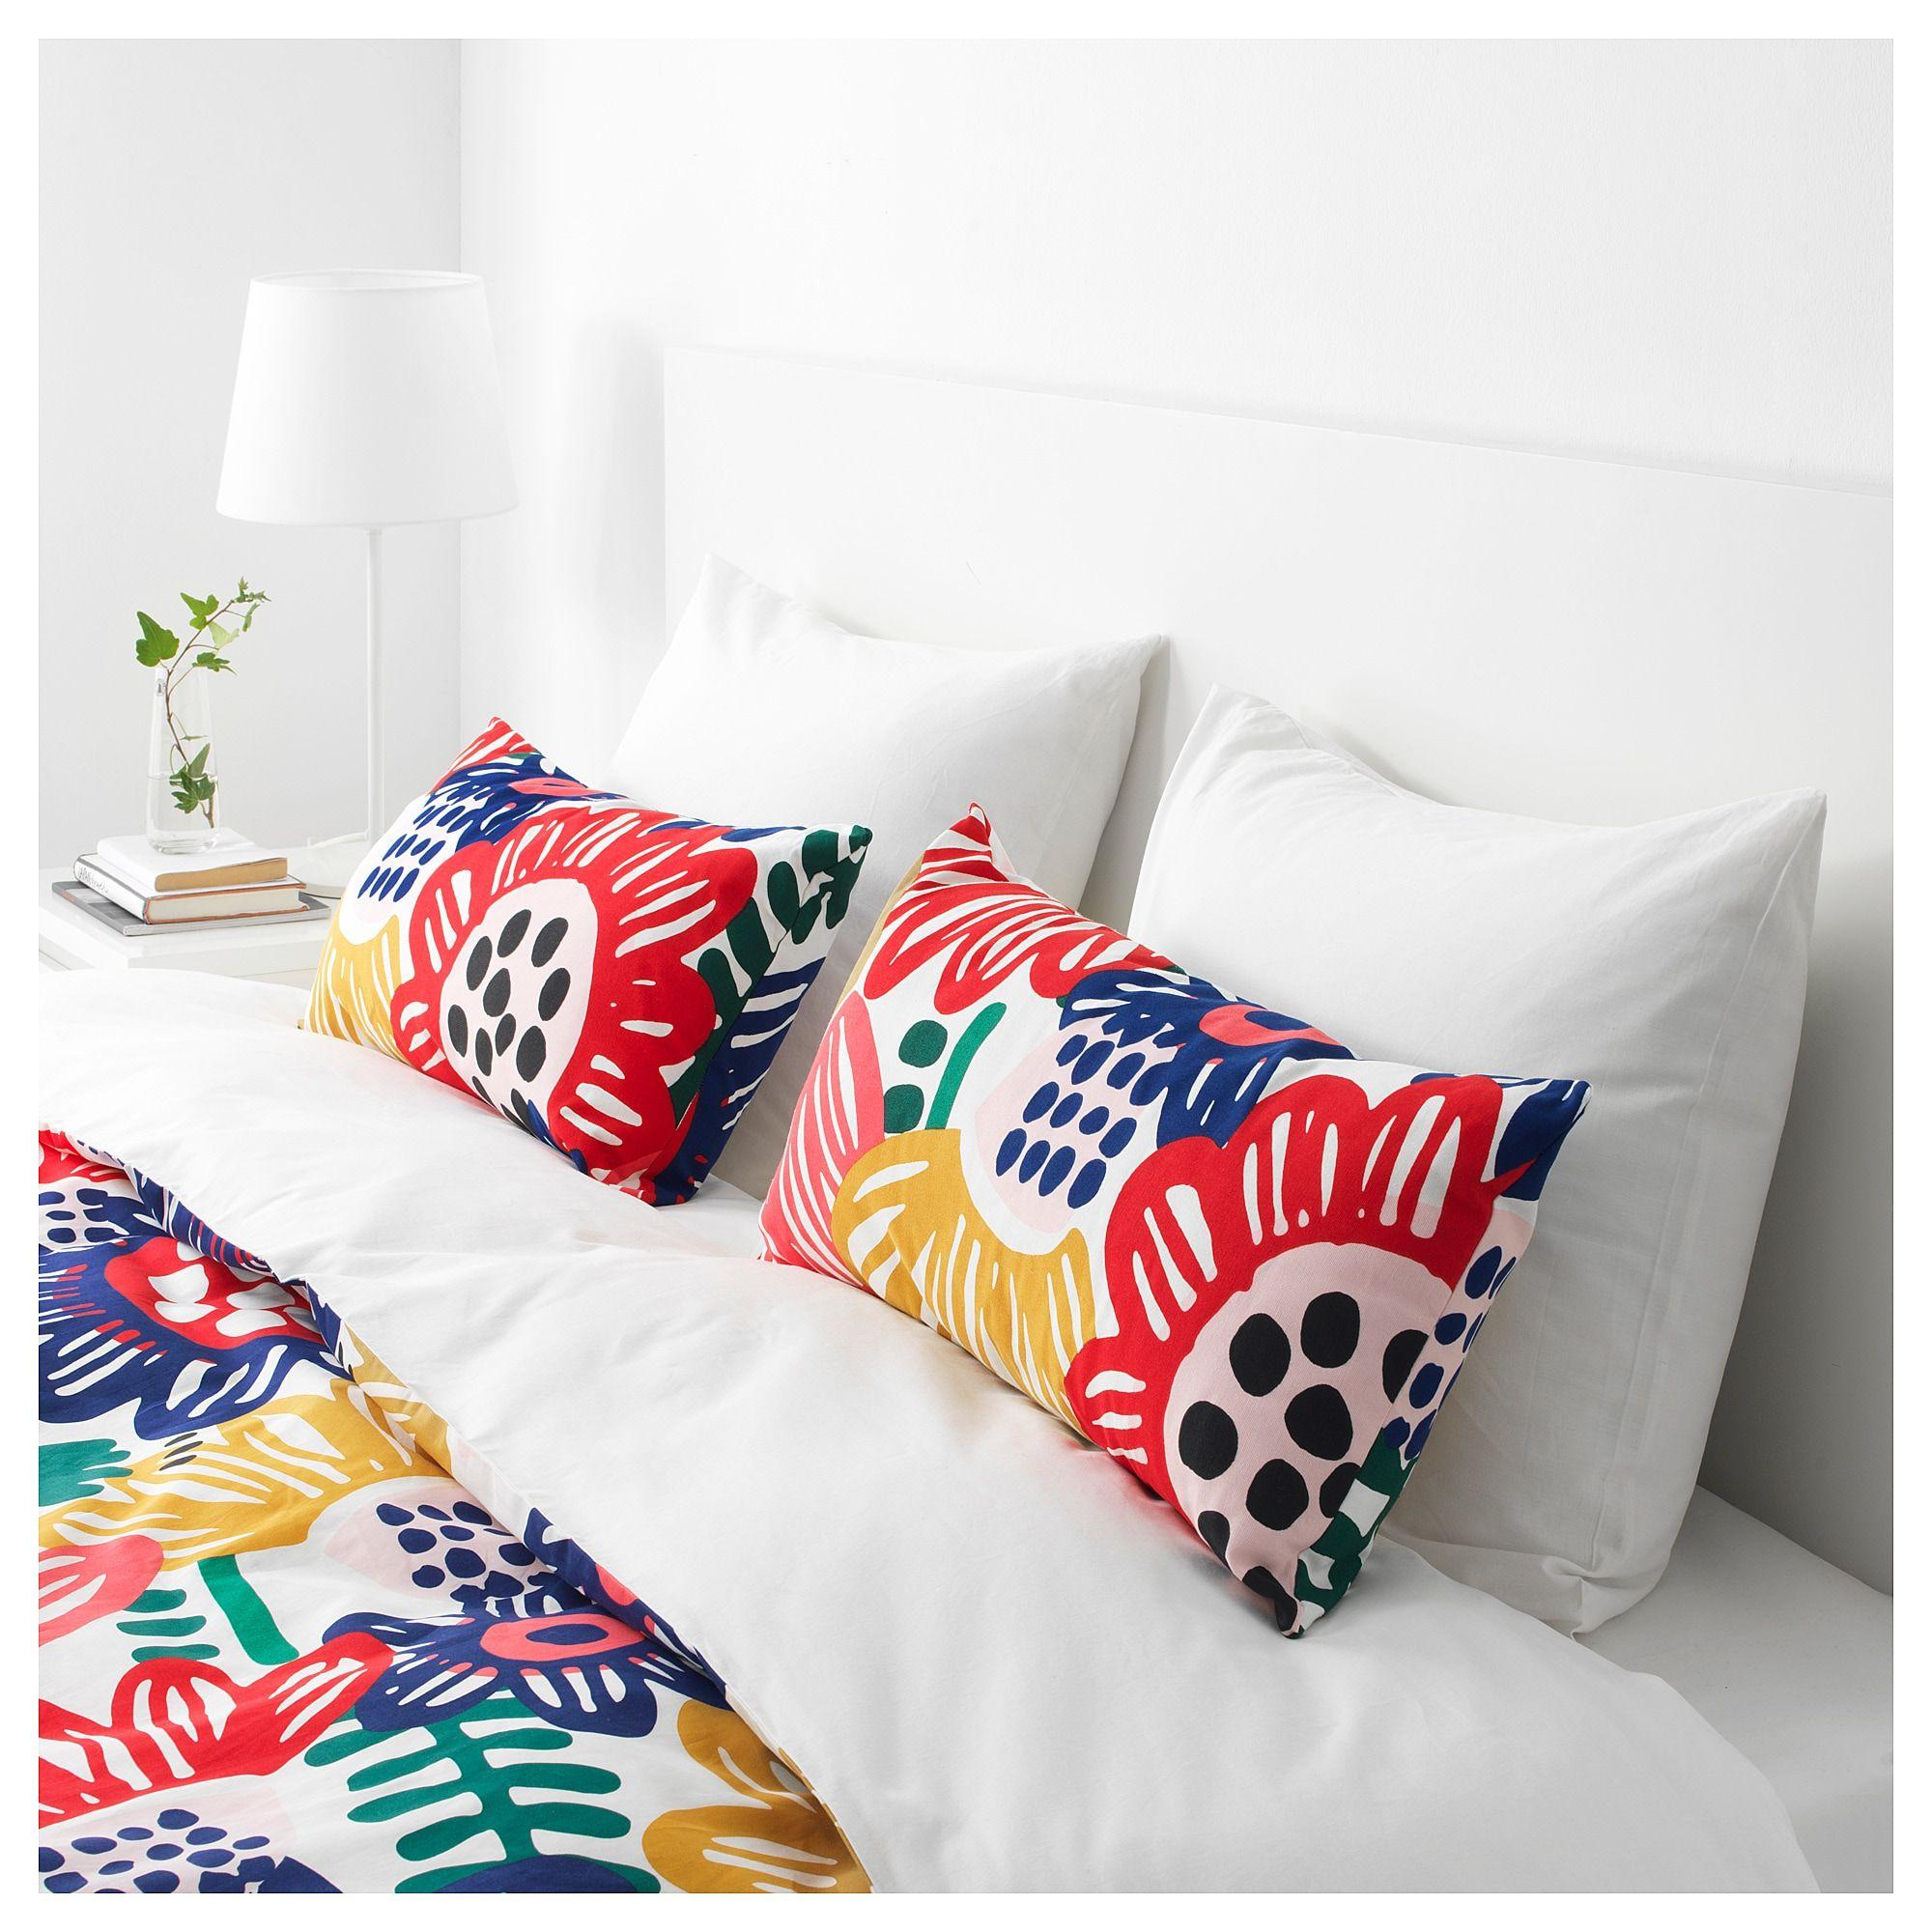 IKEA SOMMARASTER Cushion white/multicolor Cushions